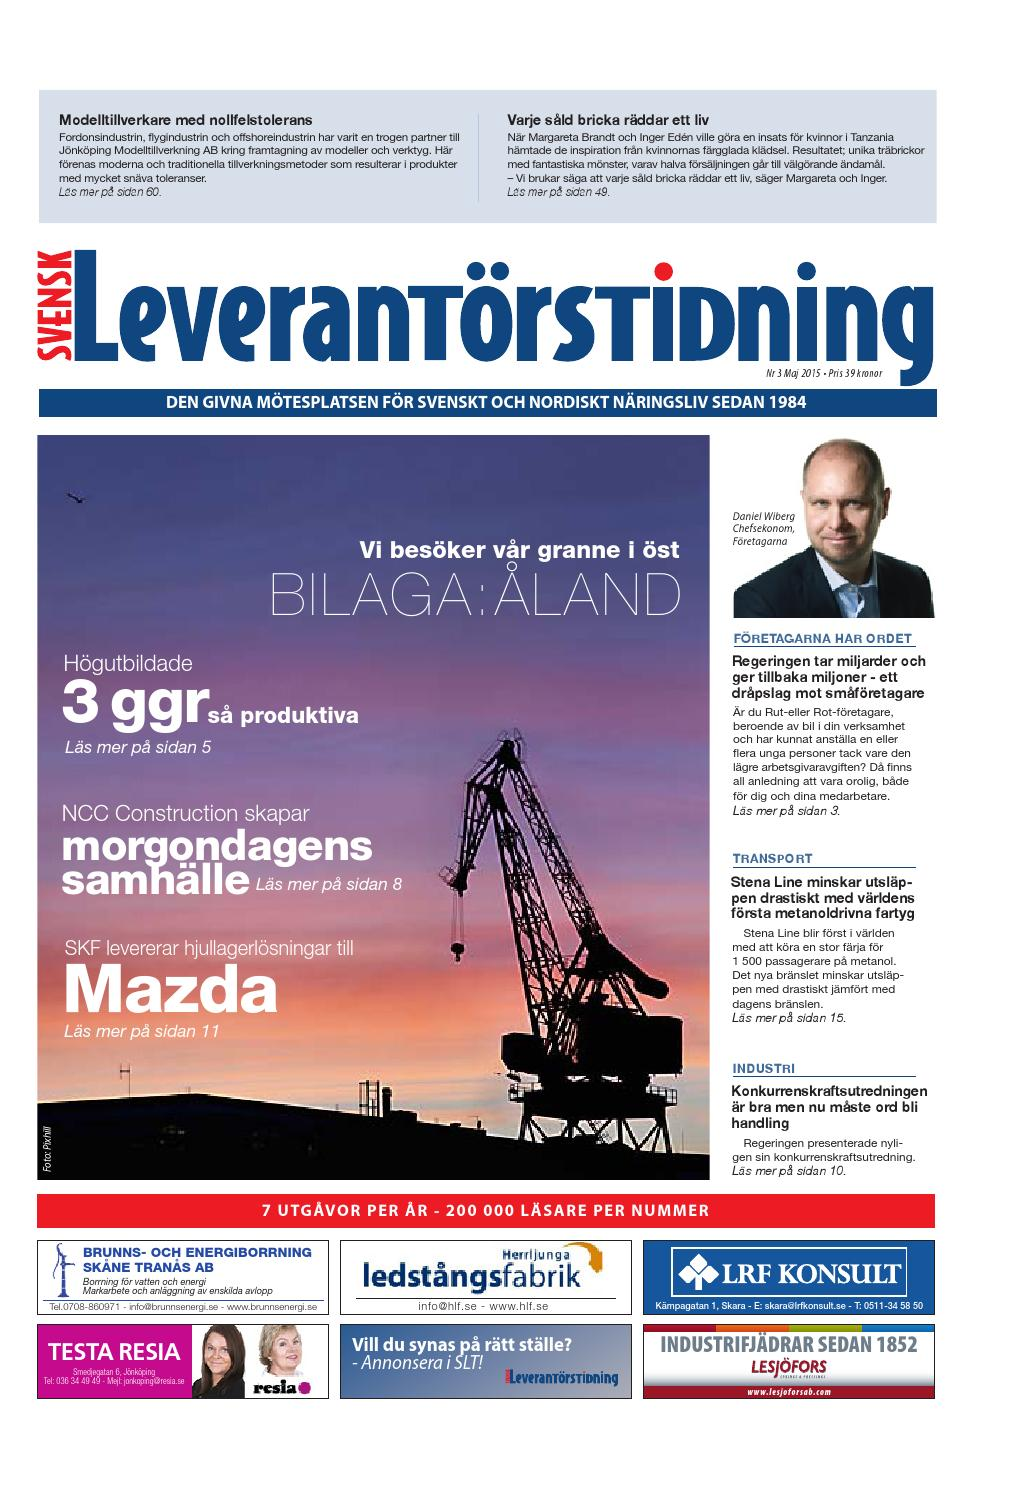 mötesplatsen telefonnummer Stenungsund